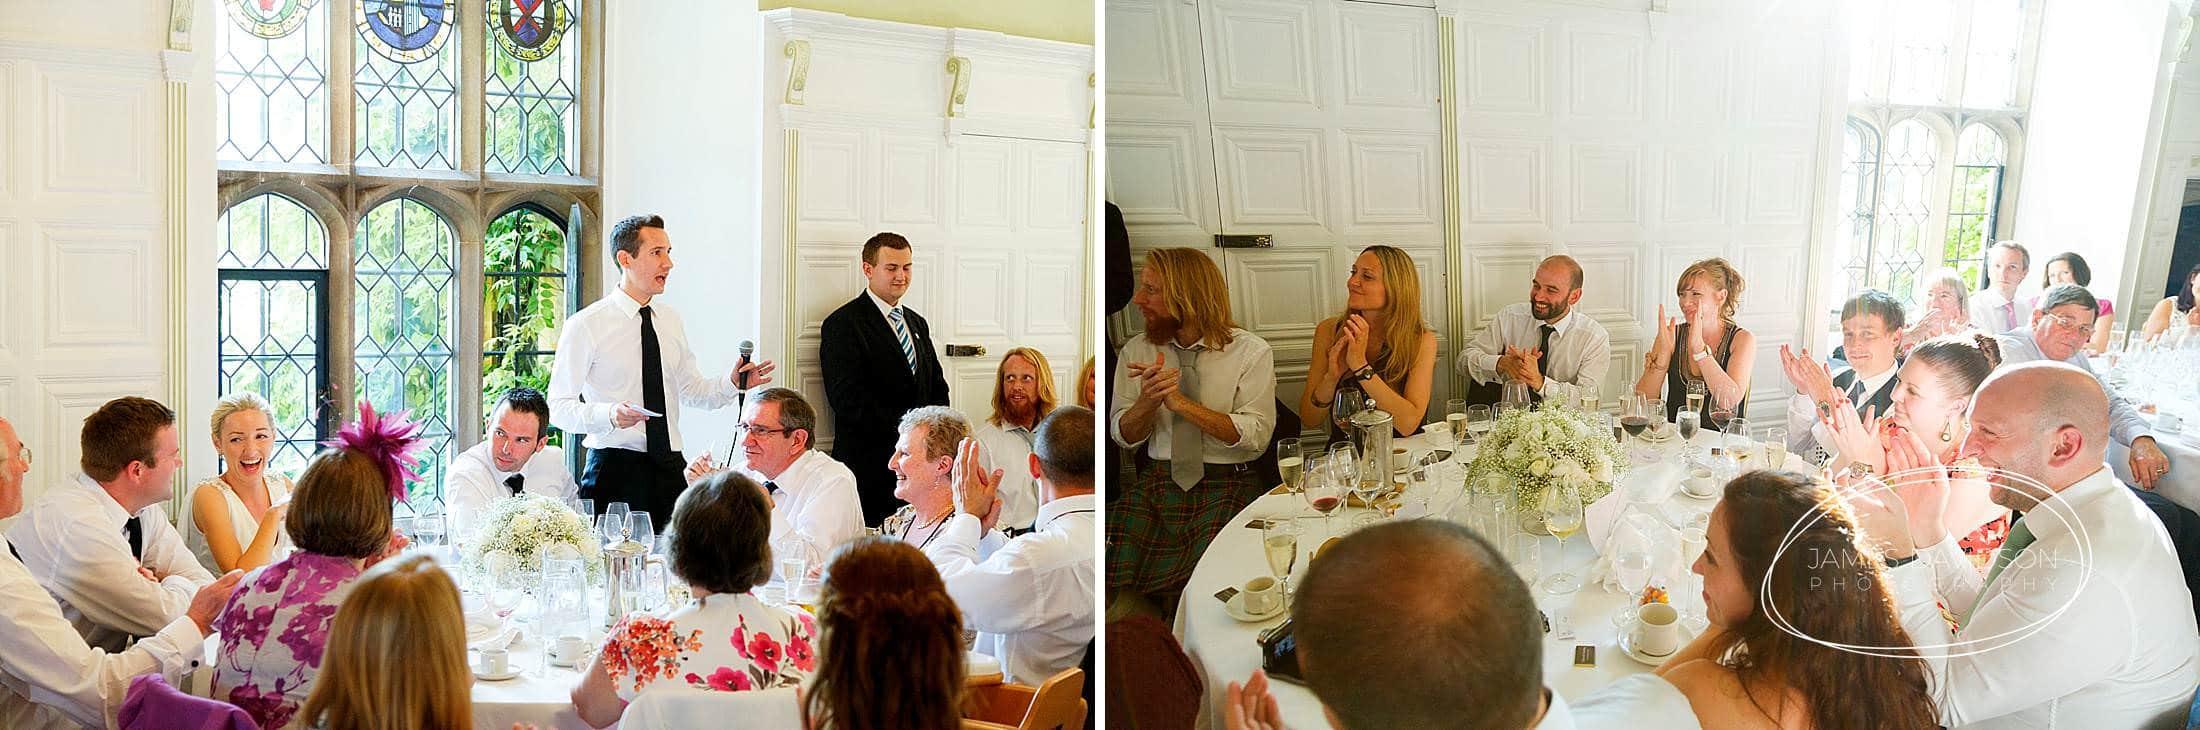 hengrave-hall-summer-wedding-077